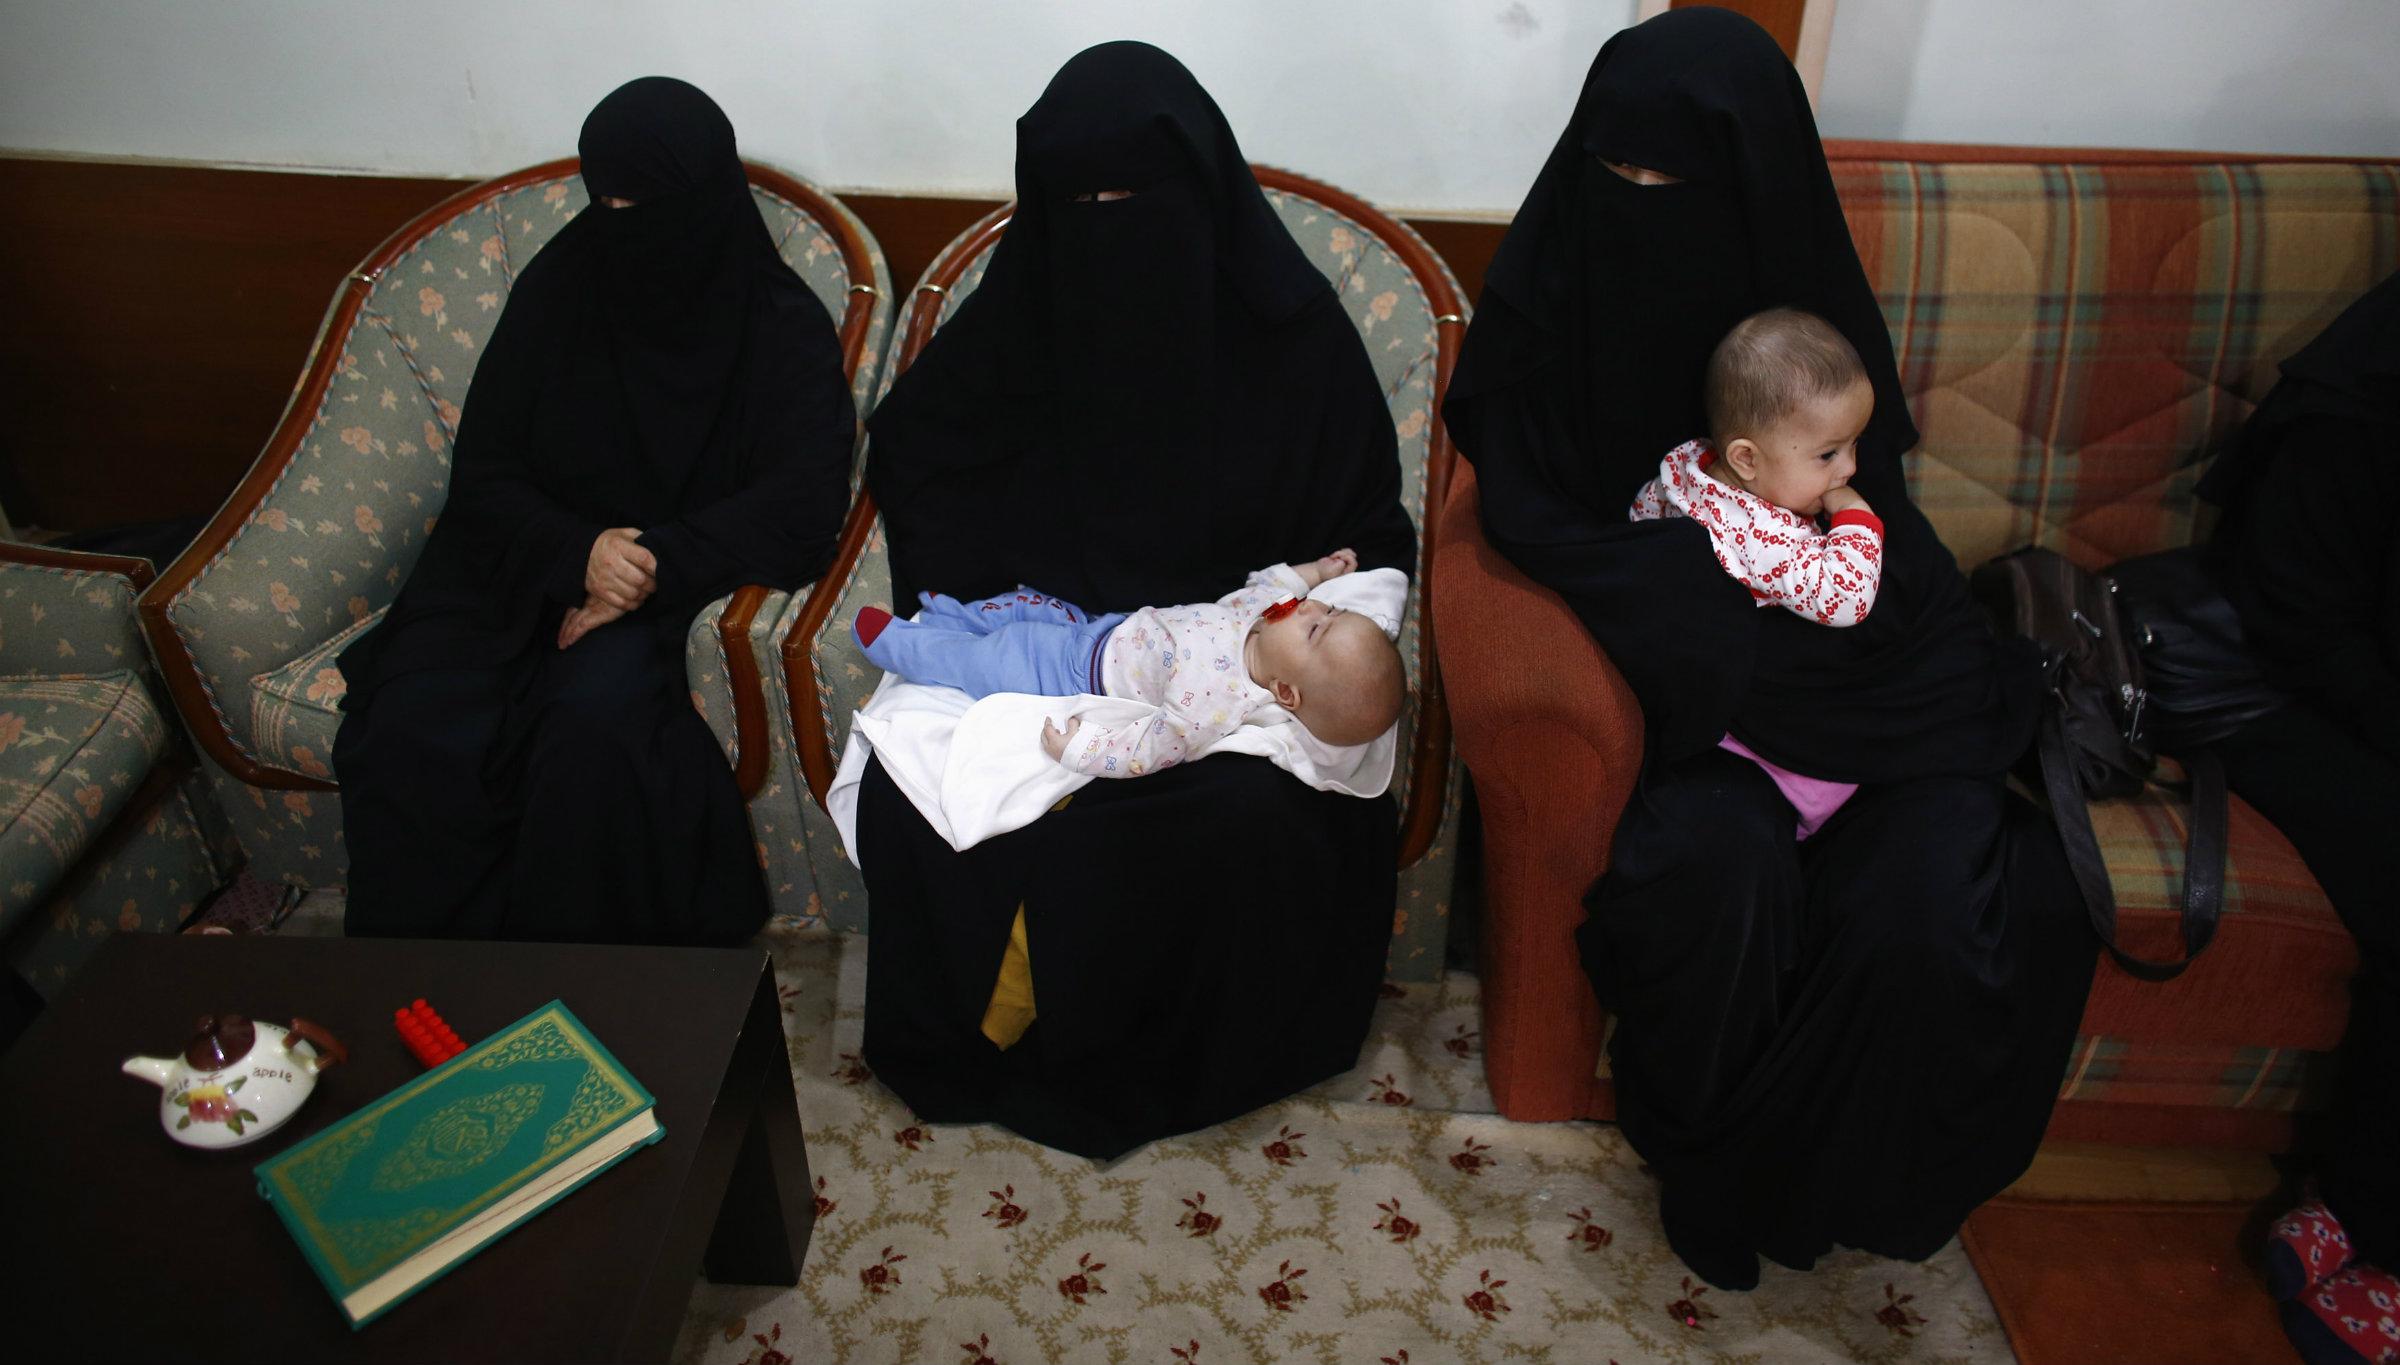 Uyghur women in Turkey